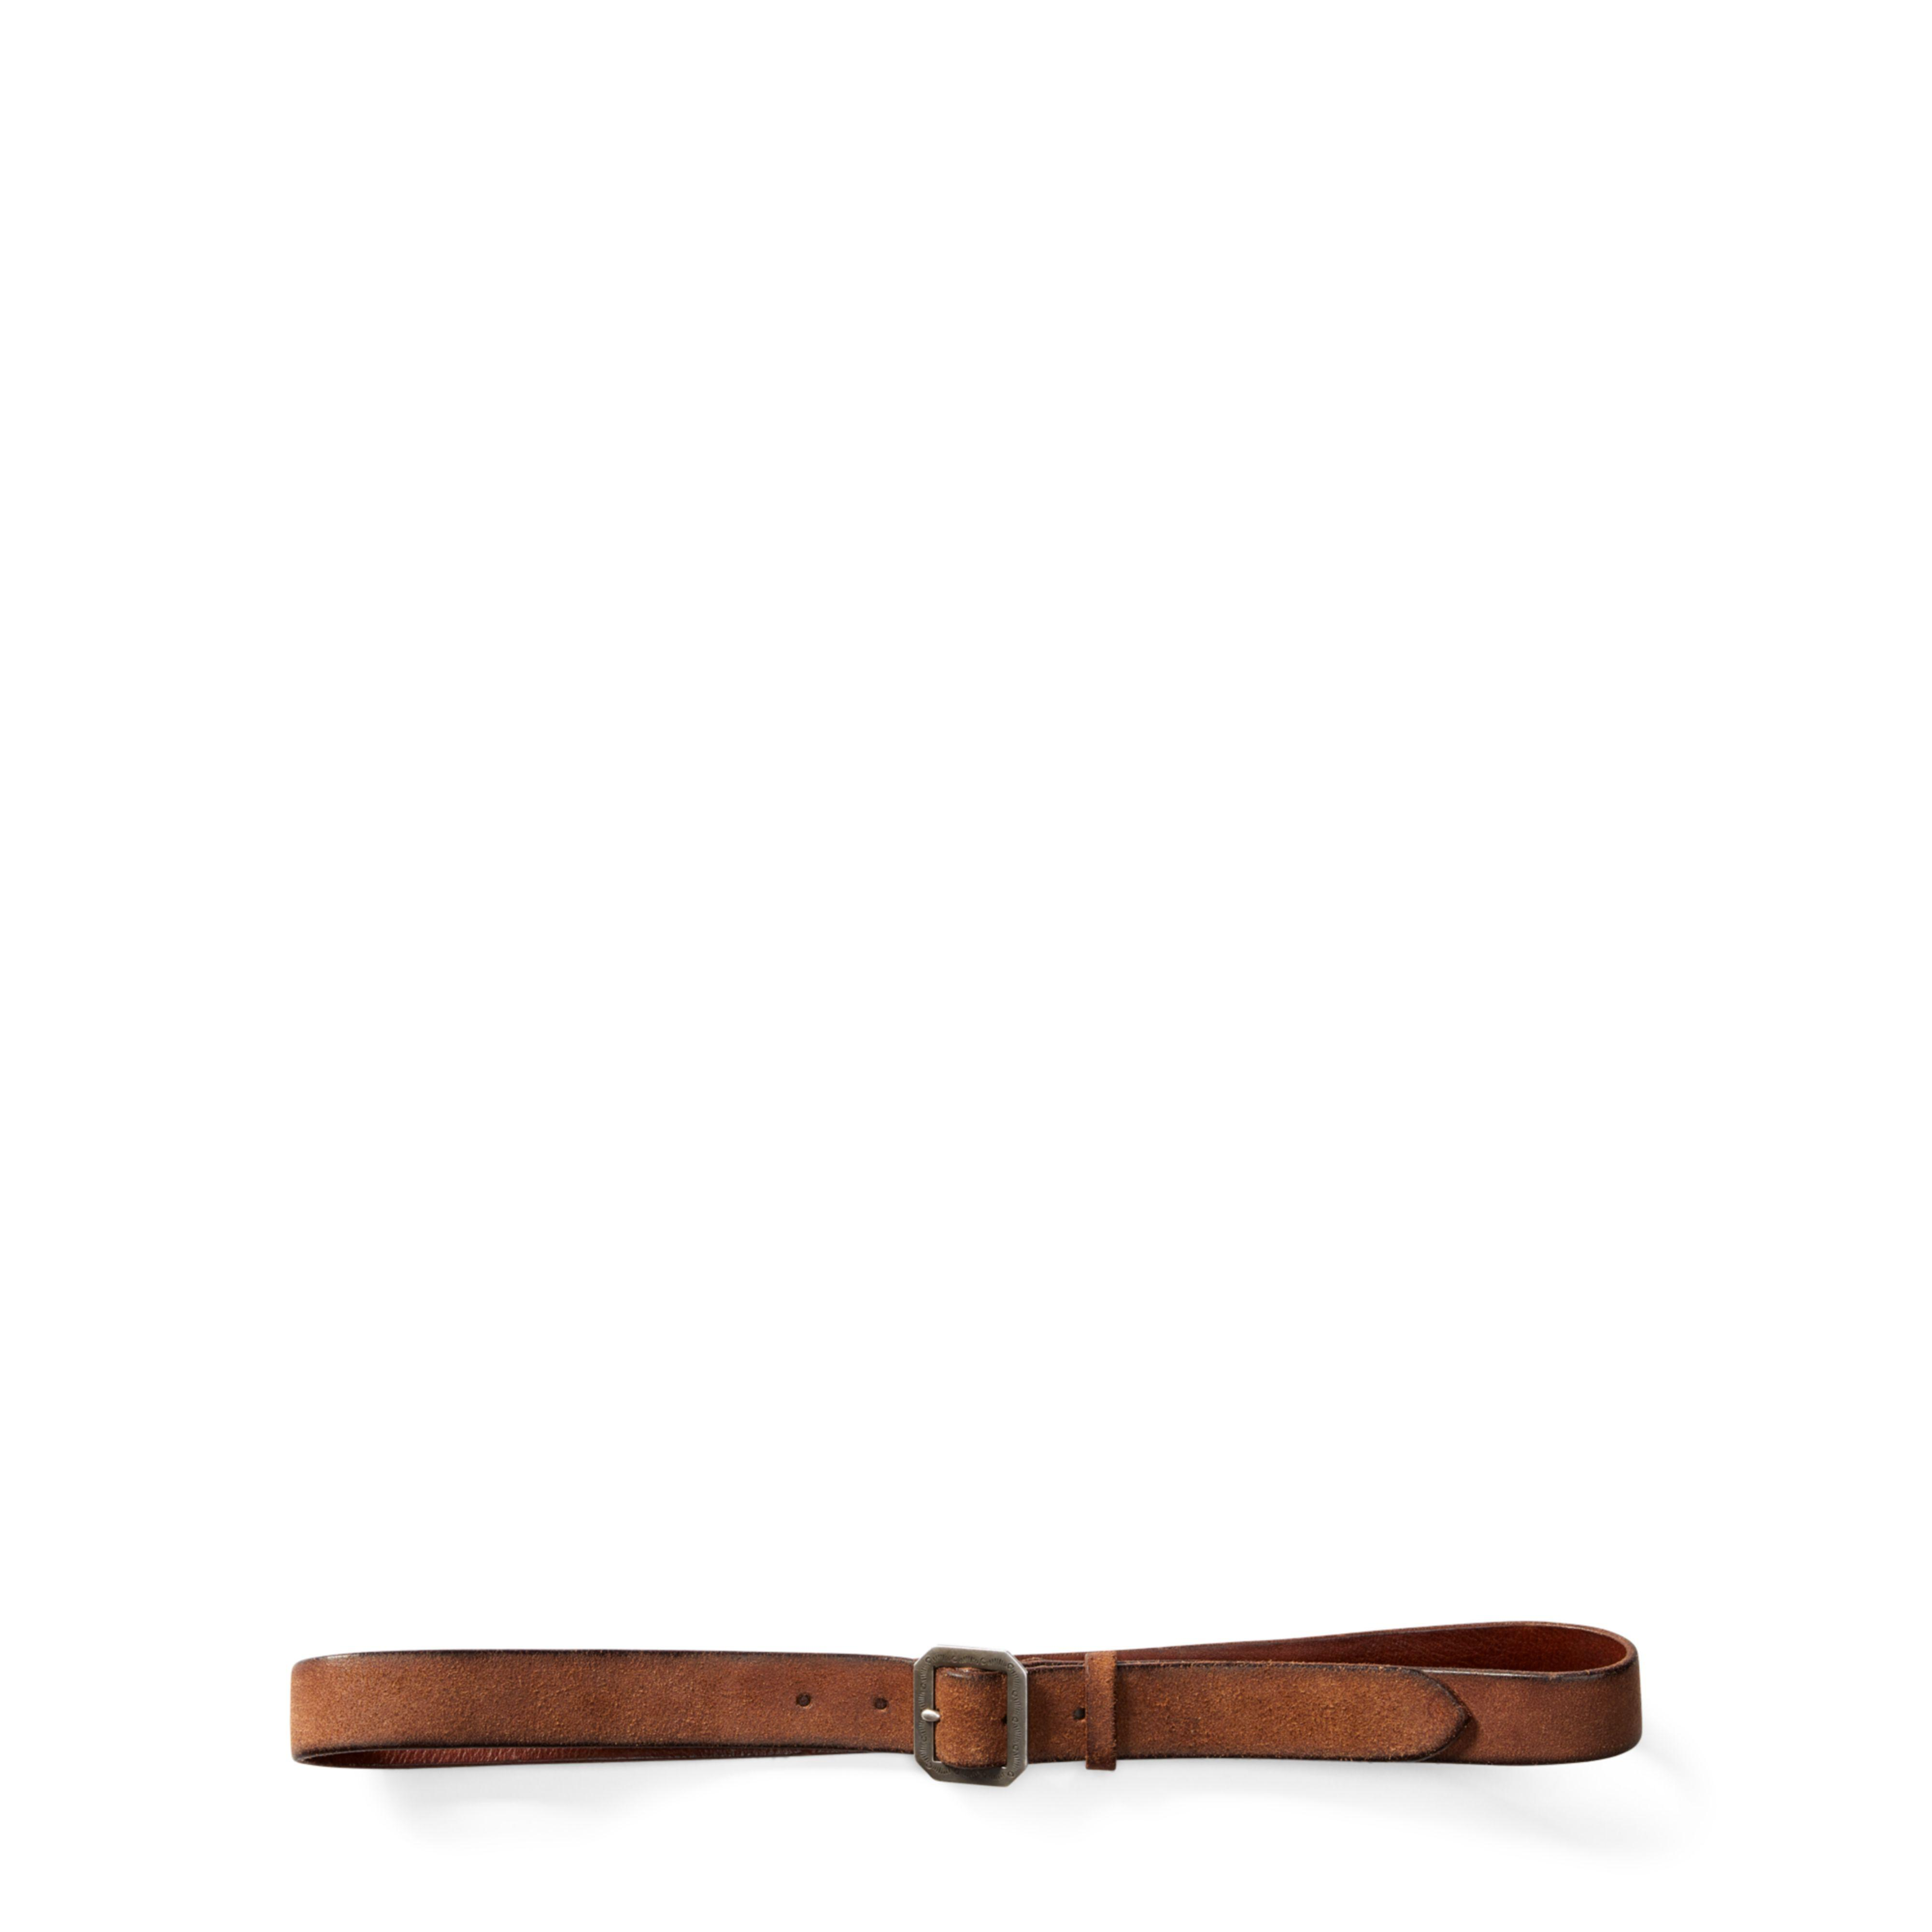 Toloc Braided Leather Belt - Brown Caravana yElhho8S